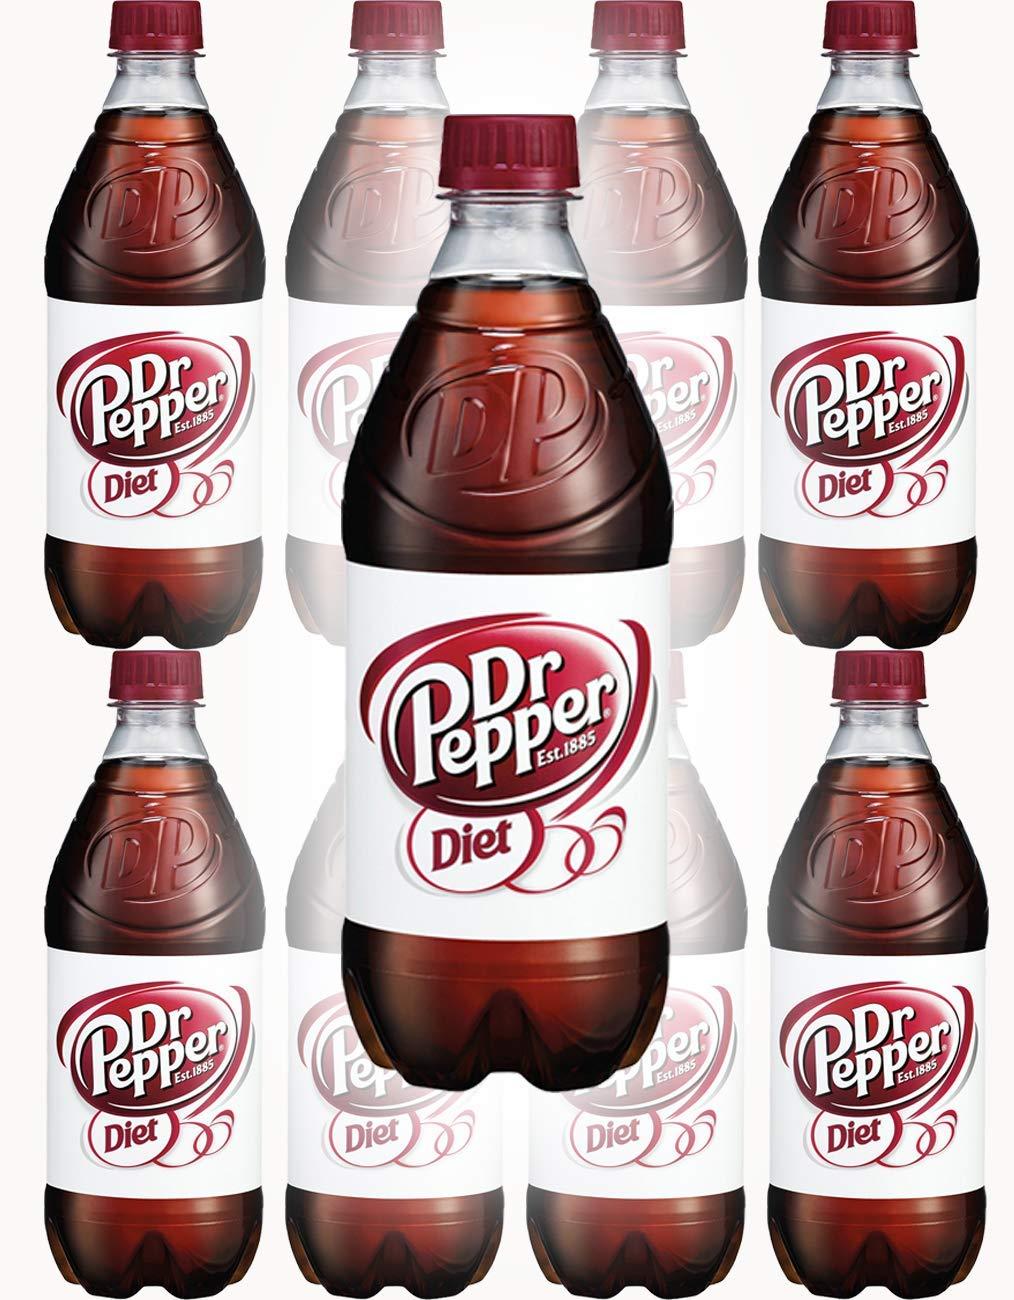 Diet Dr. Pepper Soda, 20oz Bottle (Pack of 8, Total of 160 Fl Oz)